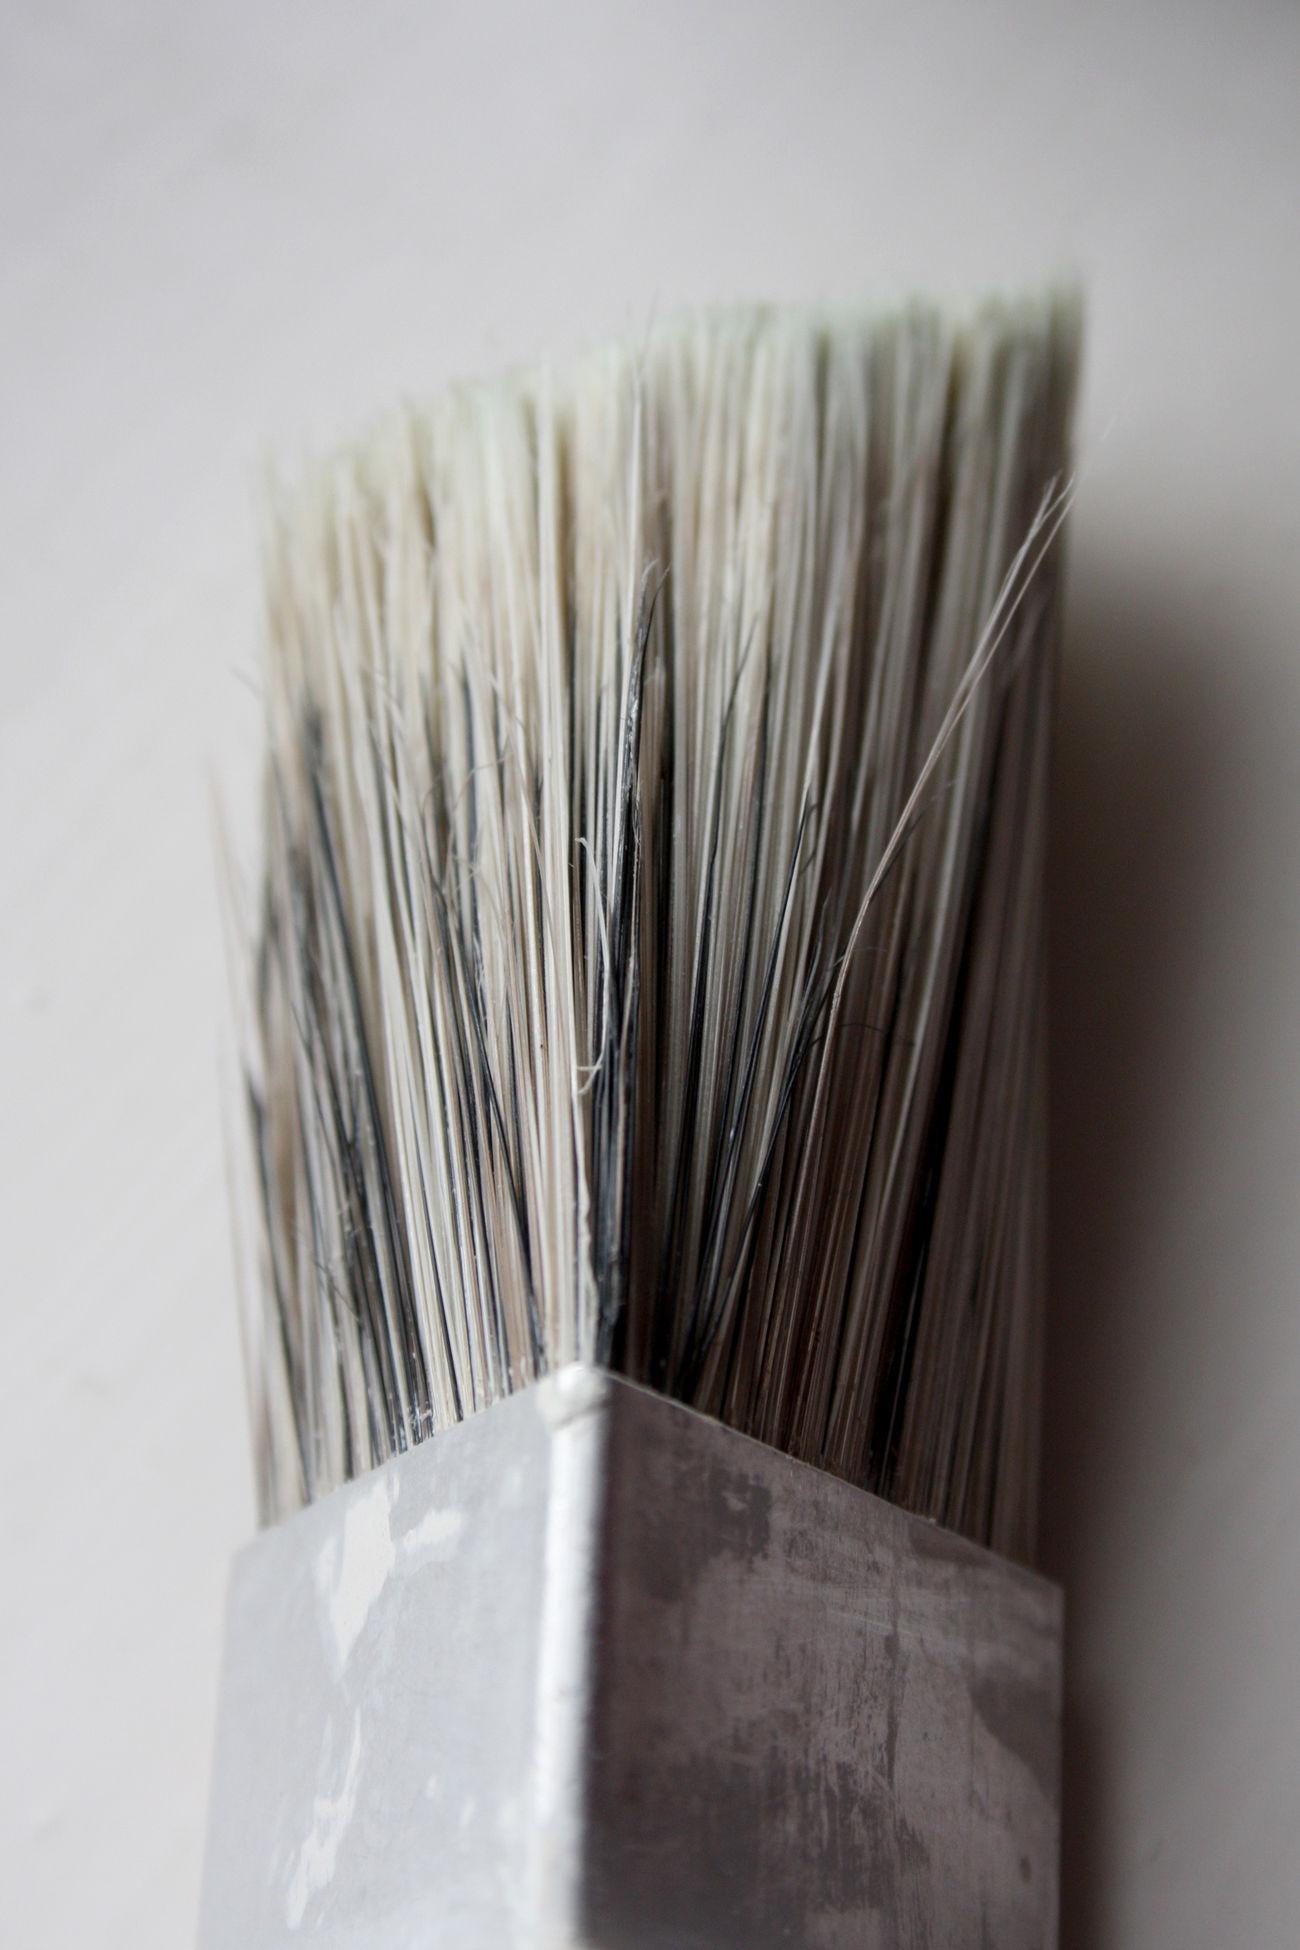 Bristles Brush Close-up Day Decorating Decoration Home Decor Home Decoration  Home Improvement Indoors  No People Paint Brush Paintbrush Painting